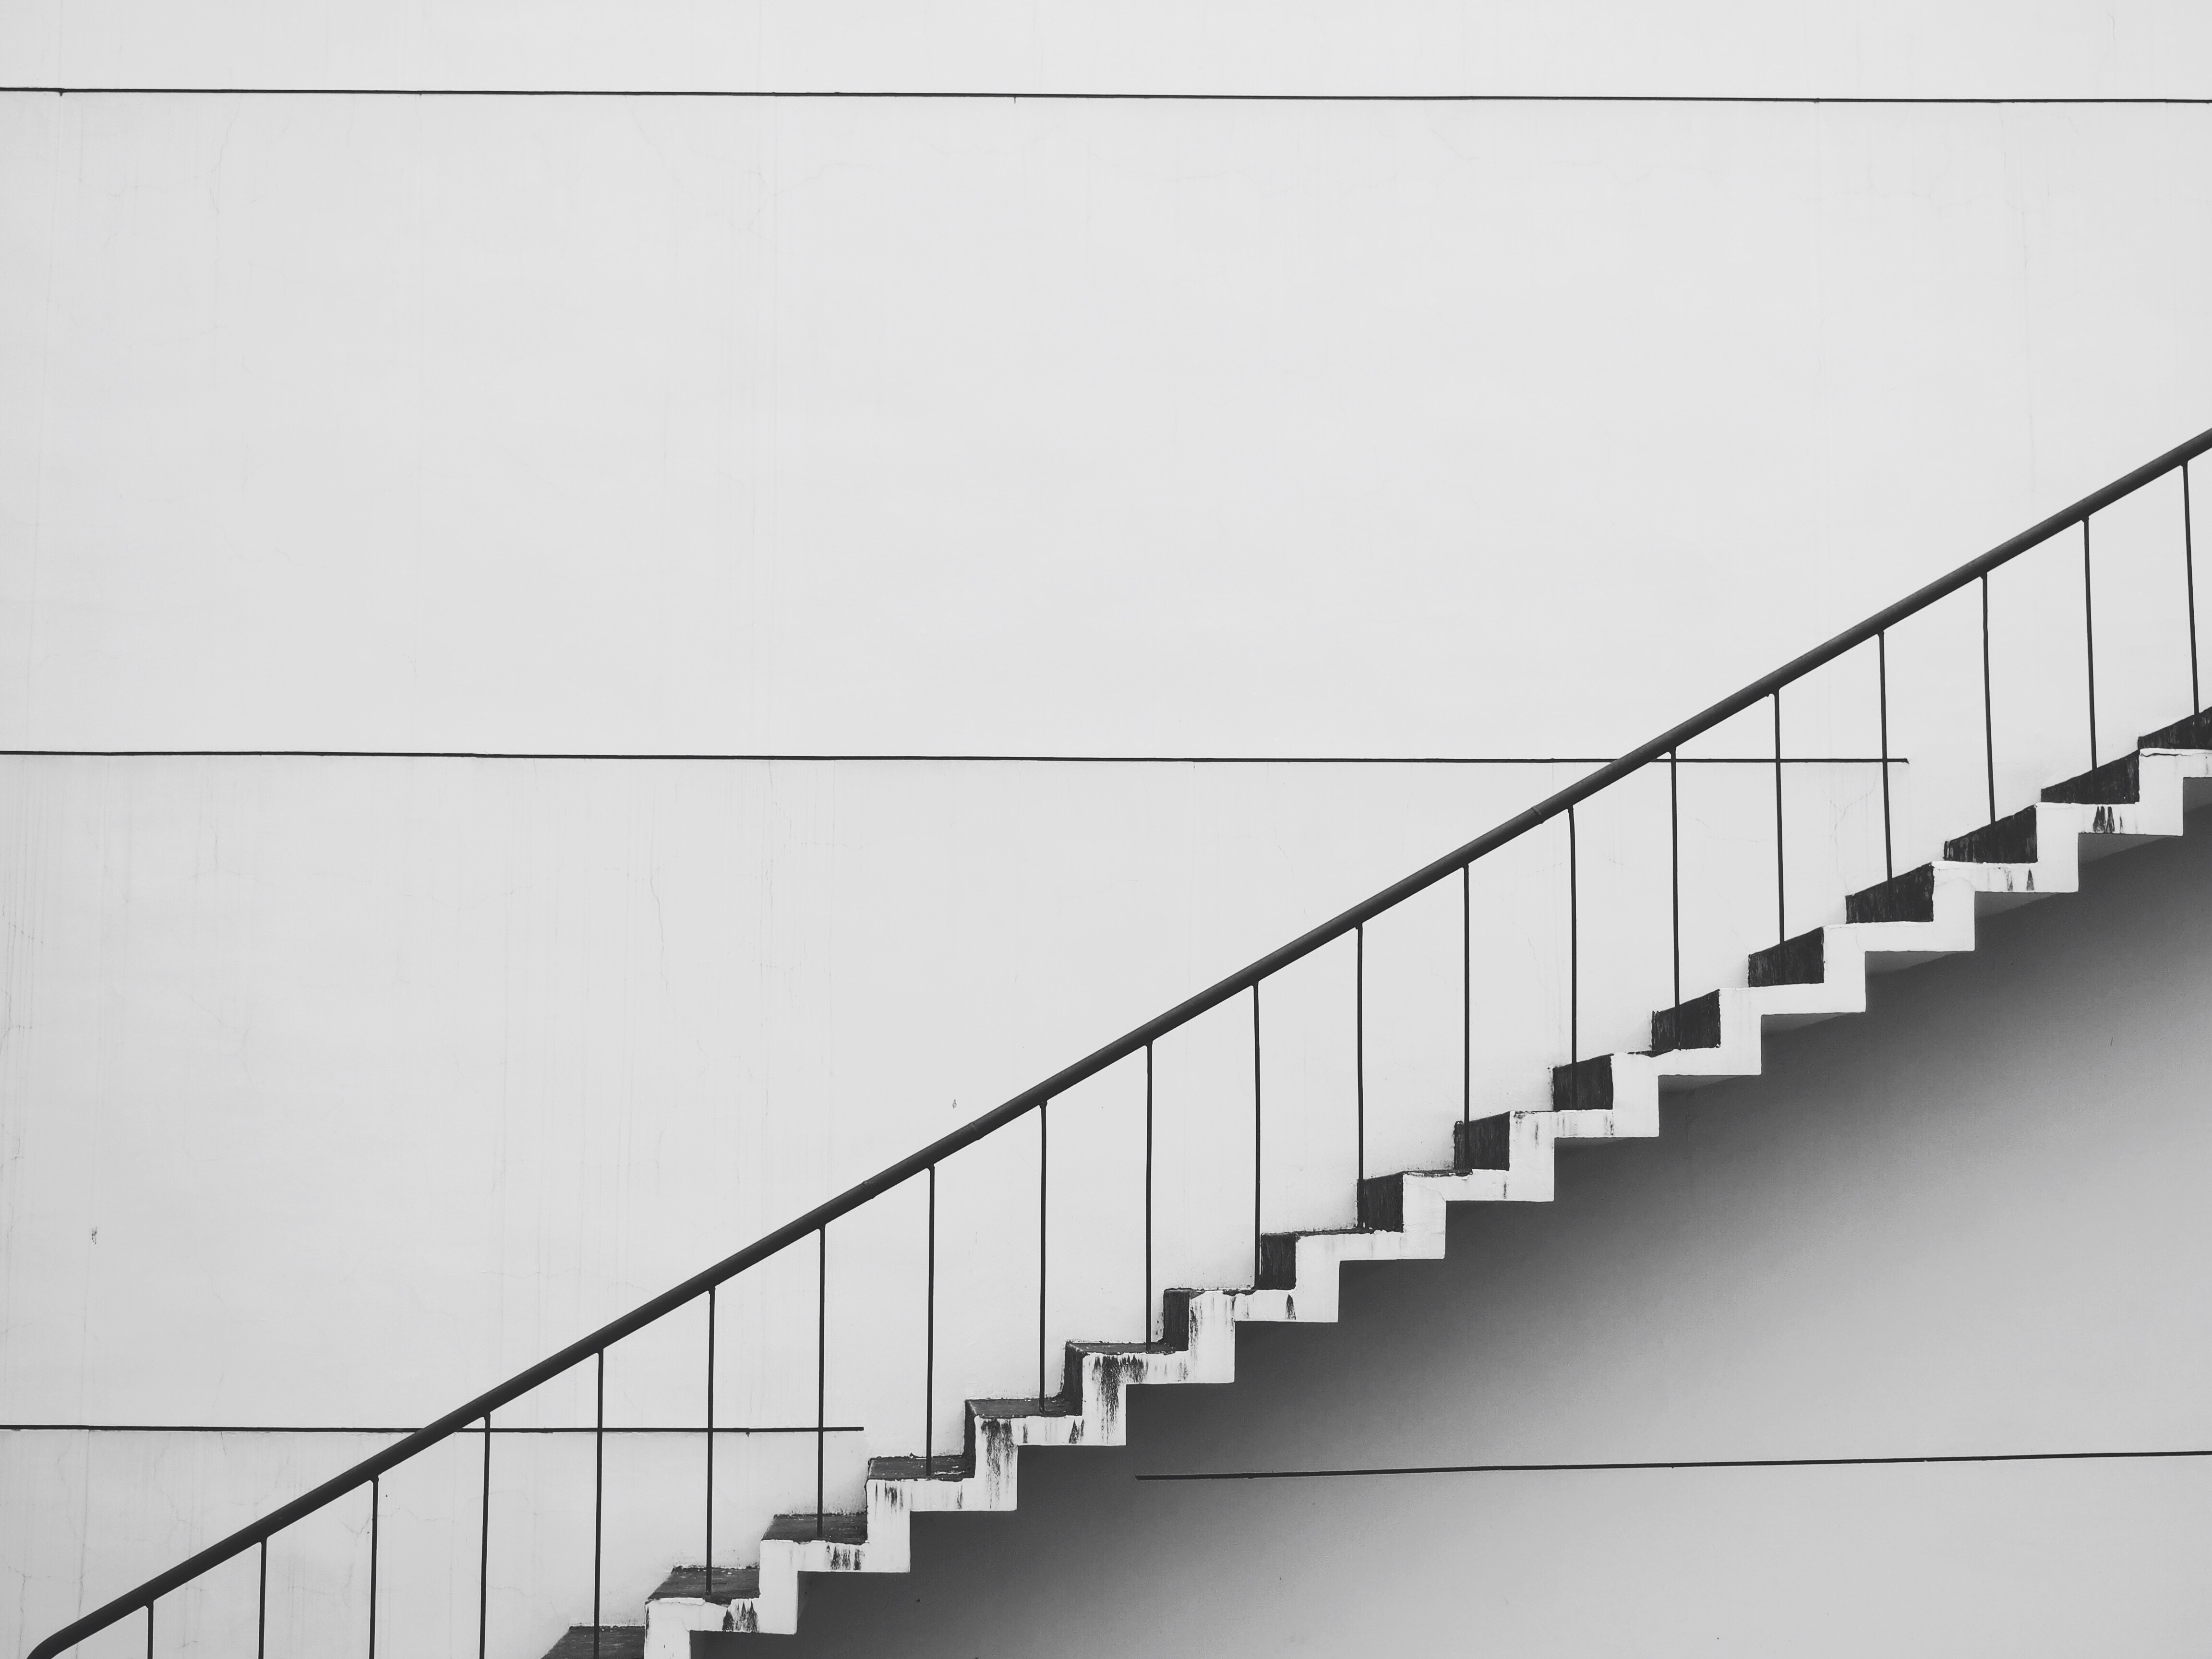 Beau 1000+ Amazing Stairs Photos · Pexels · Free Stock Photos